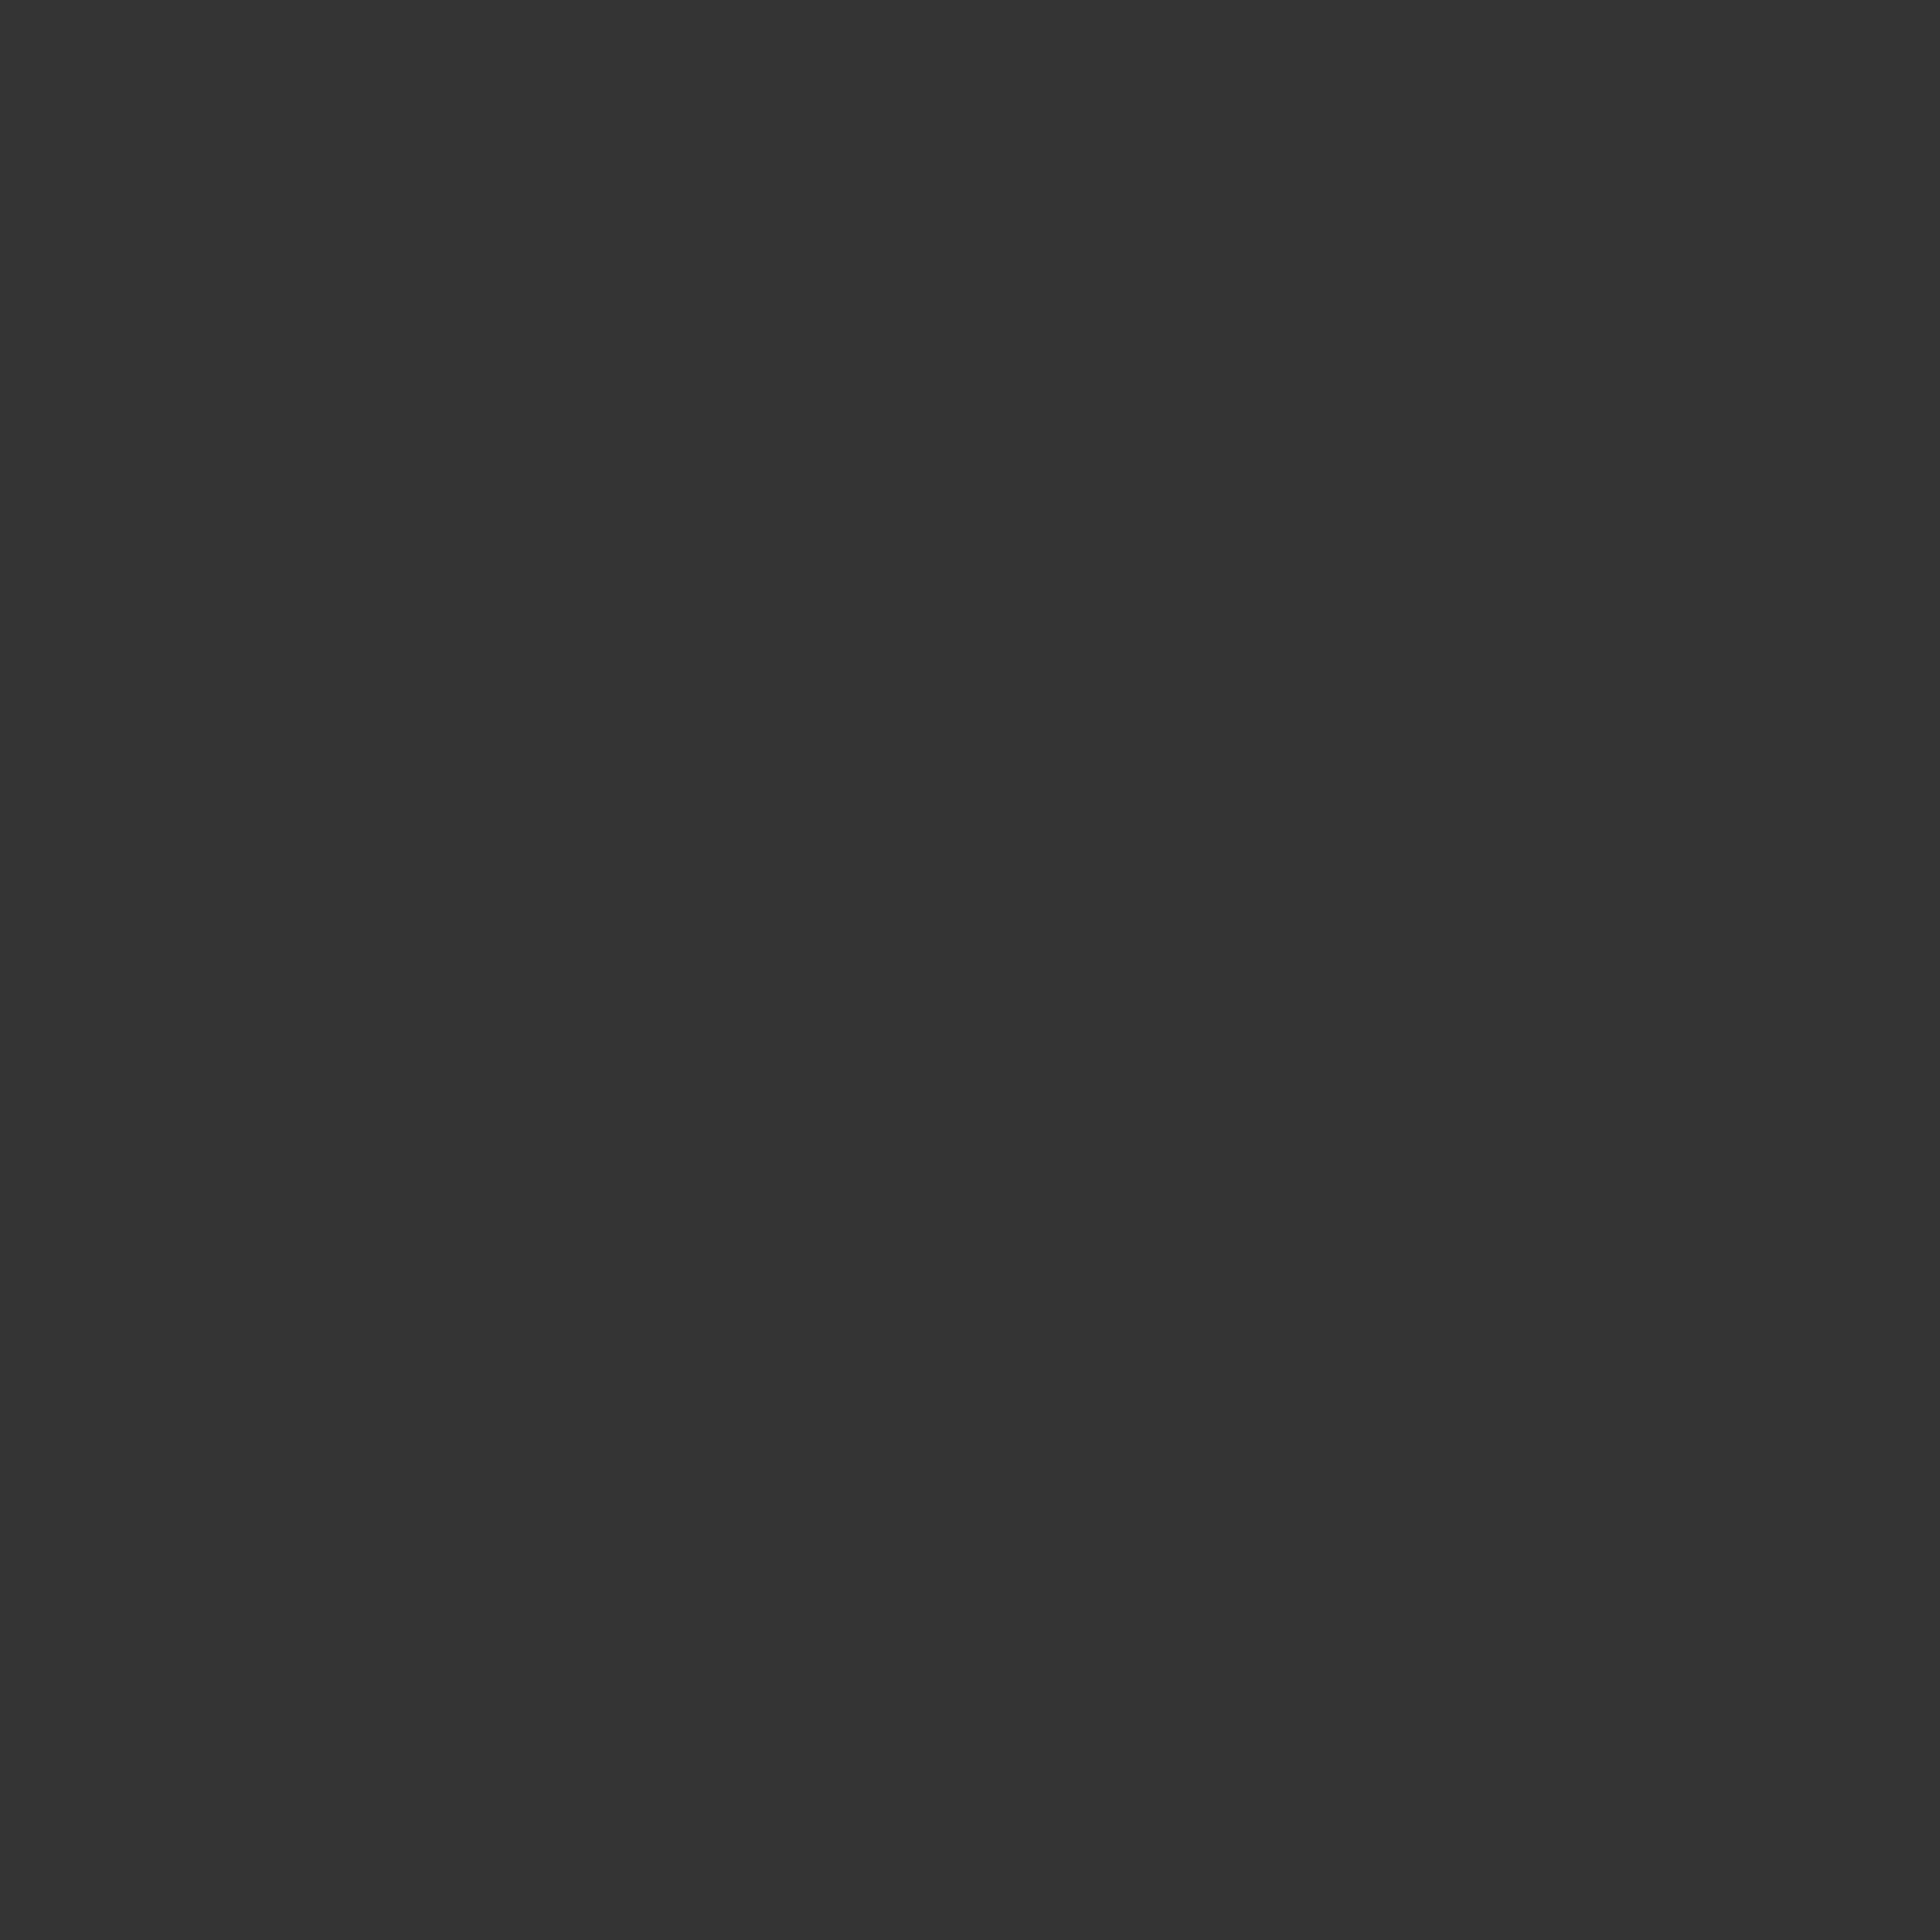 3600x3600 Jet Solid Color Background